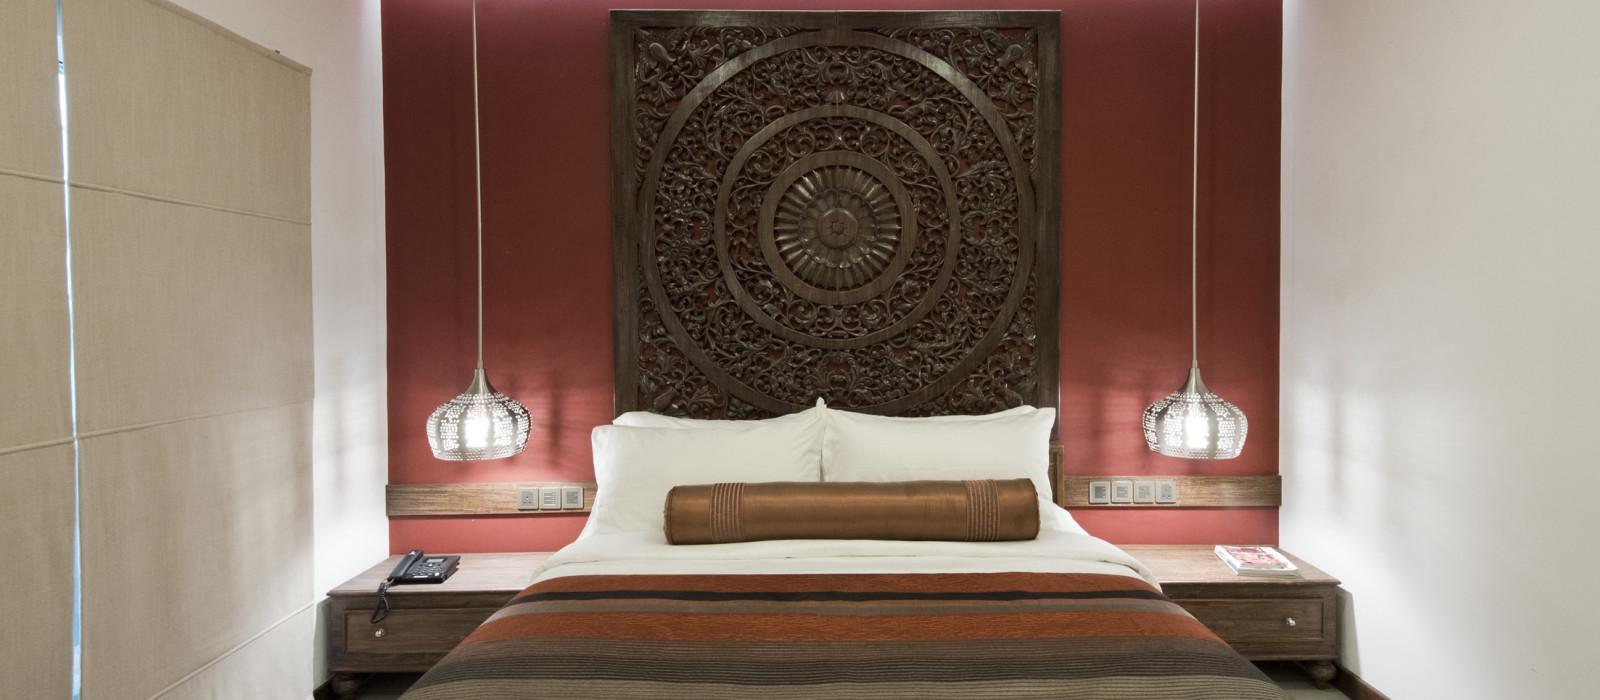 Hotel Jetwing Jaffna Sri Lanka